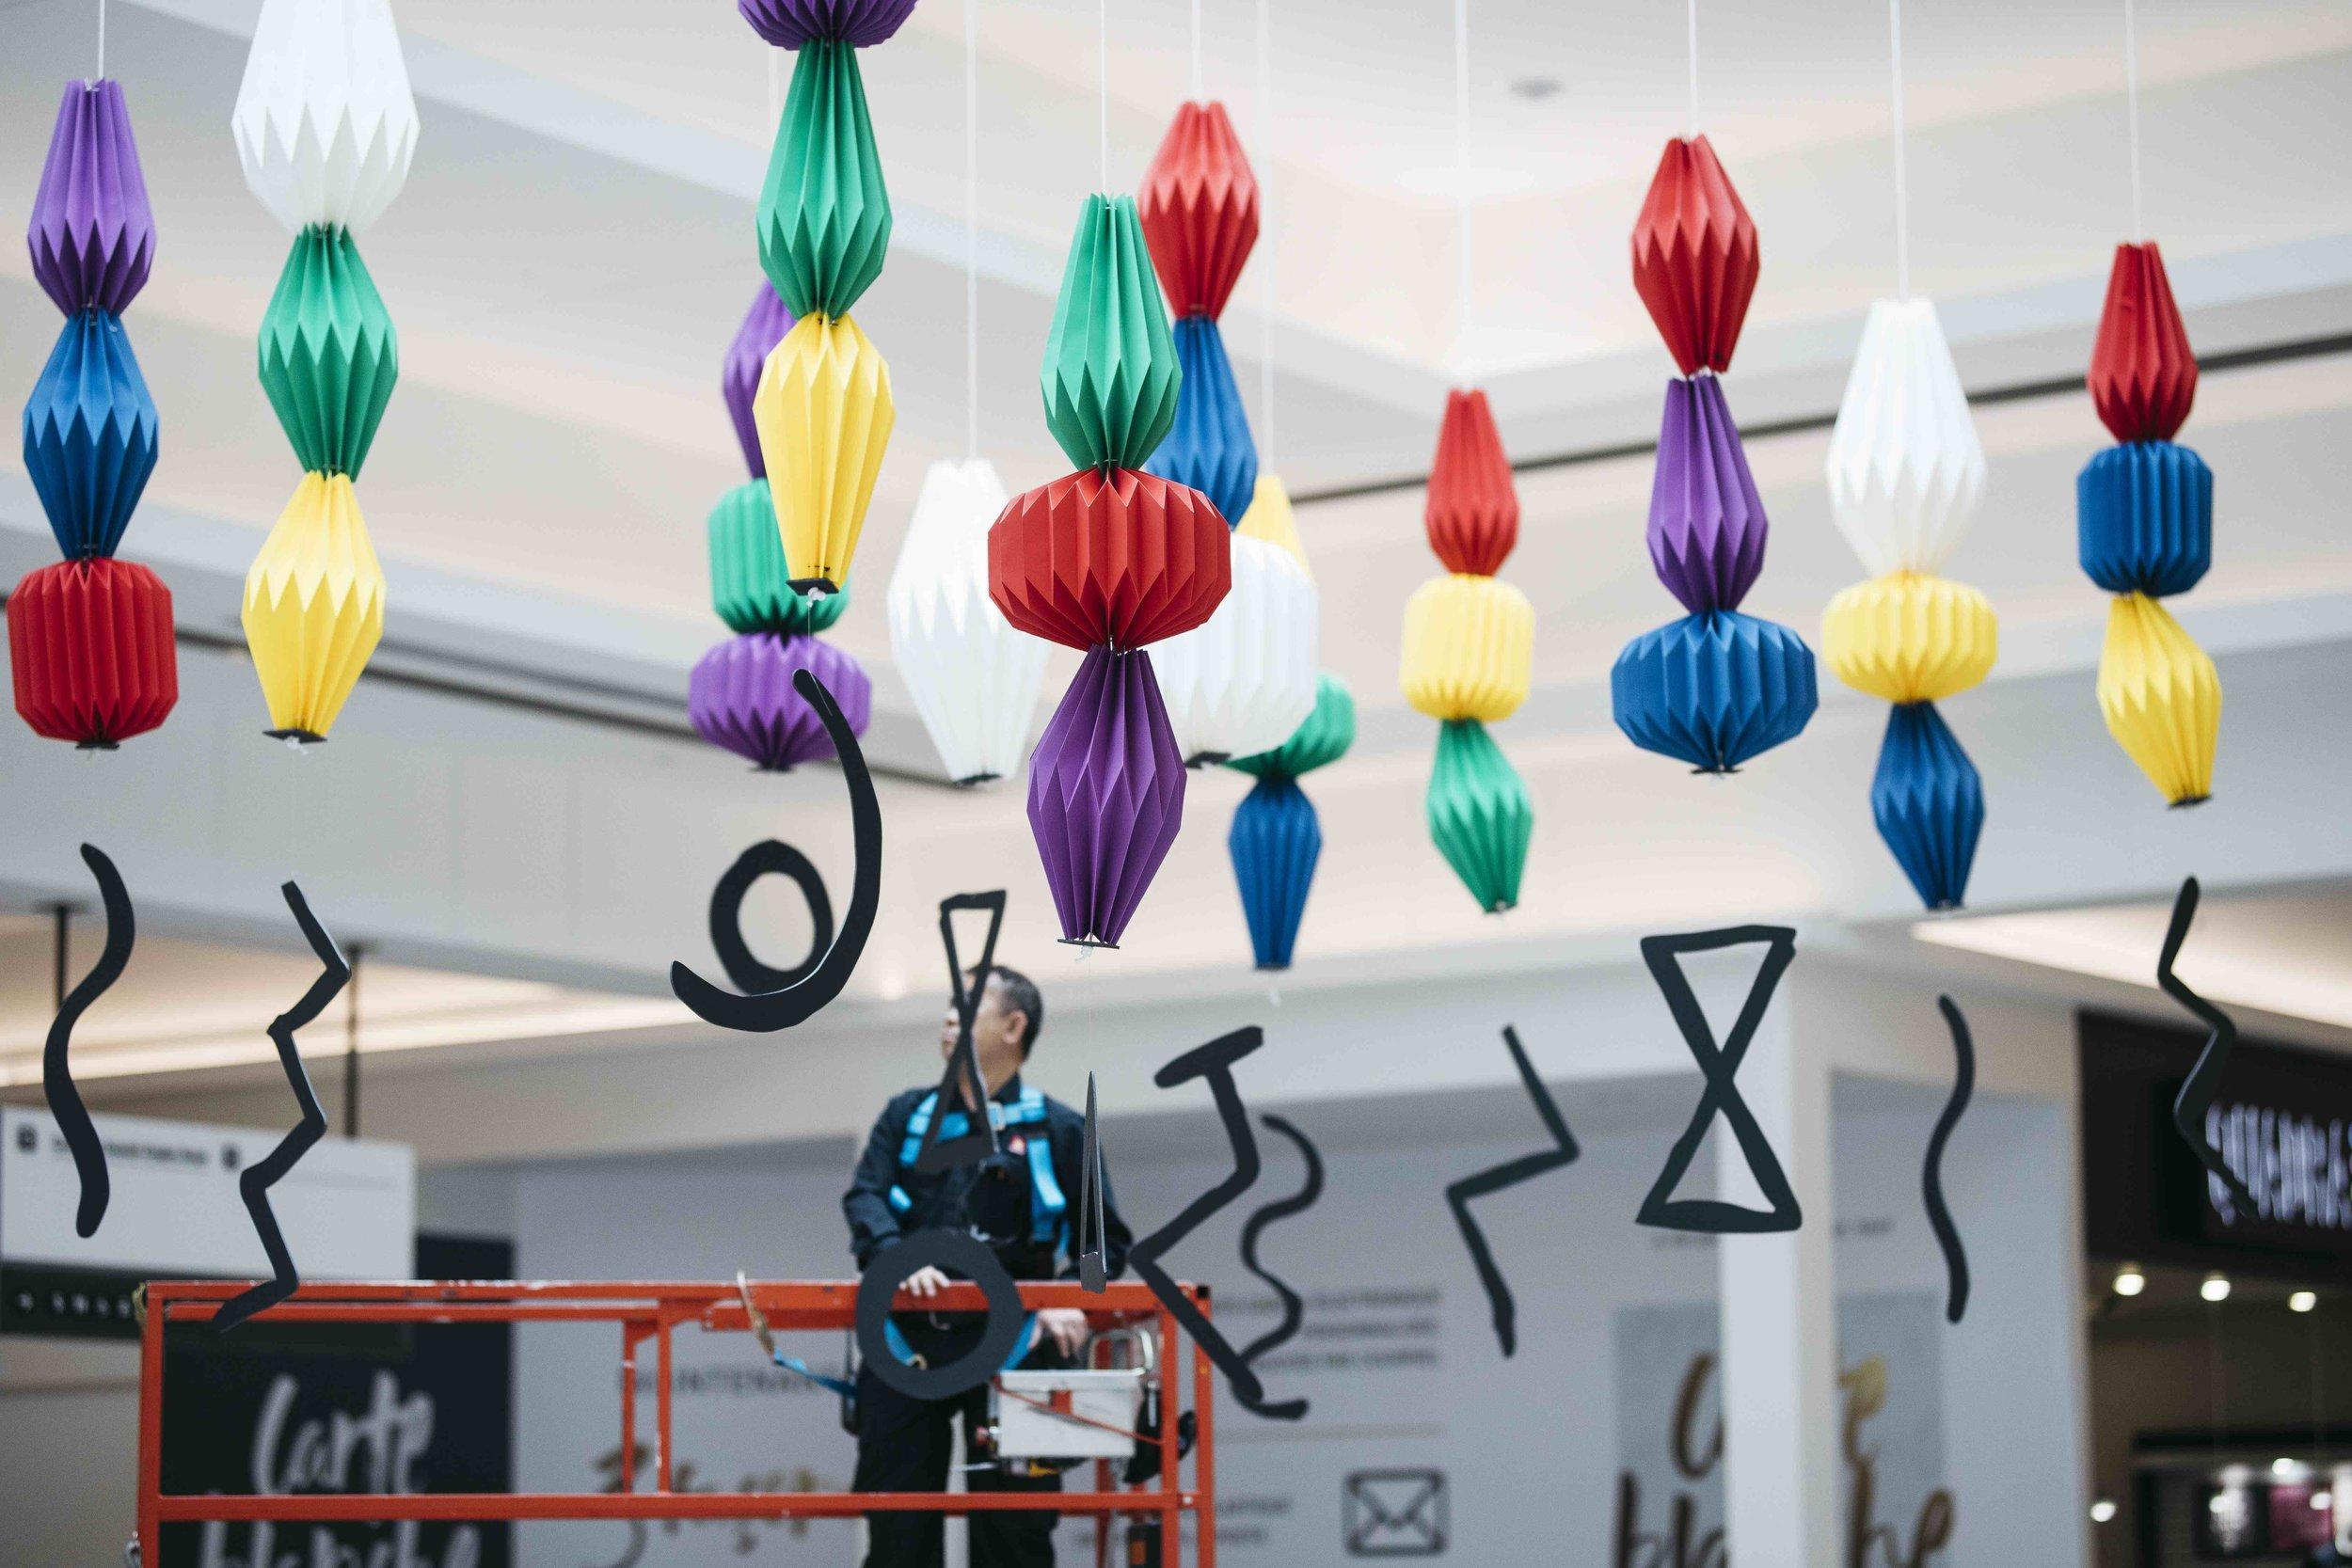 miss cloudy pauline loctin ancestrale paper art installation origami mural wall 13.jpg